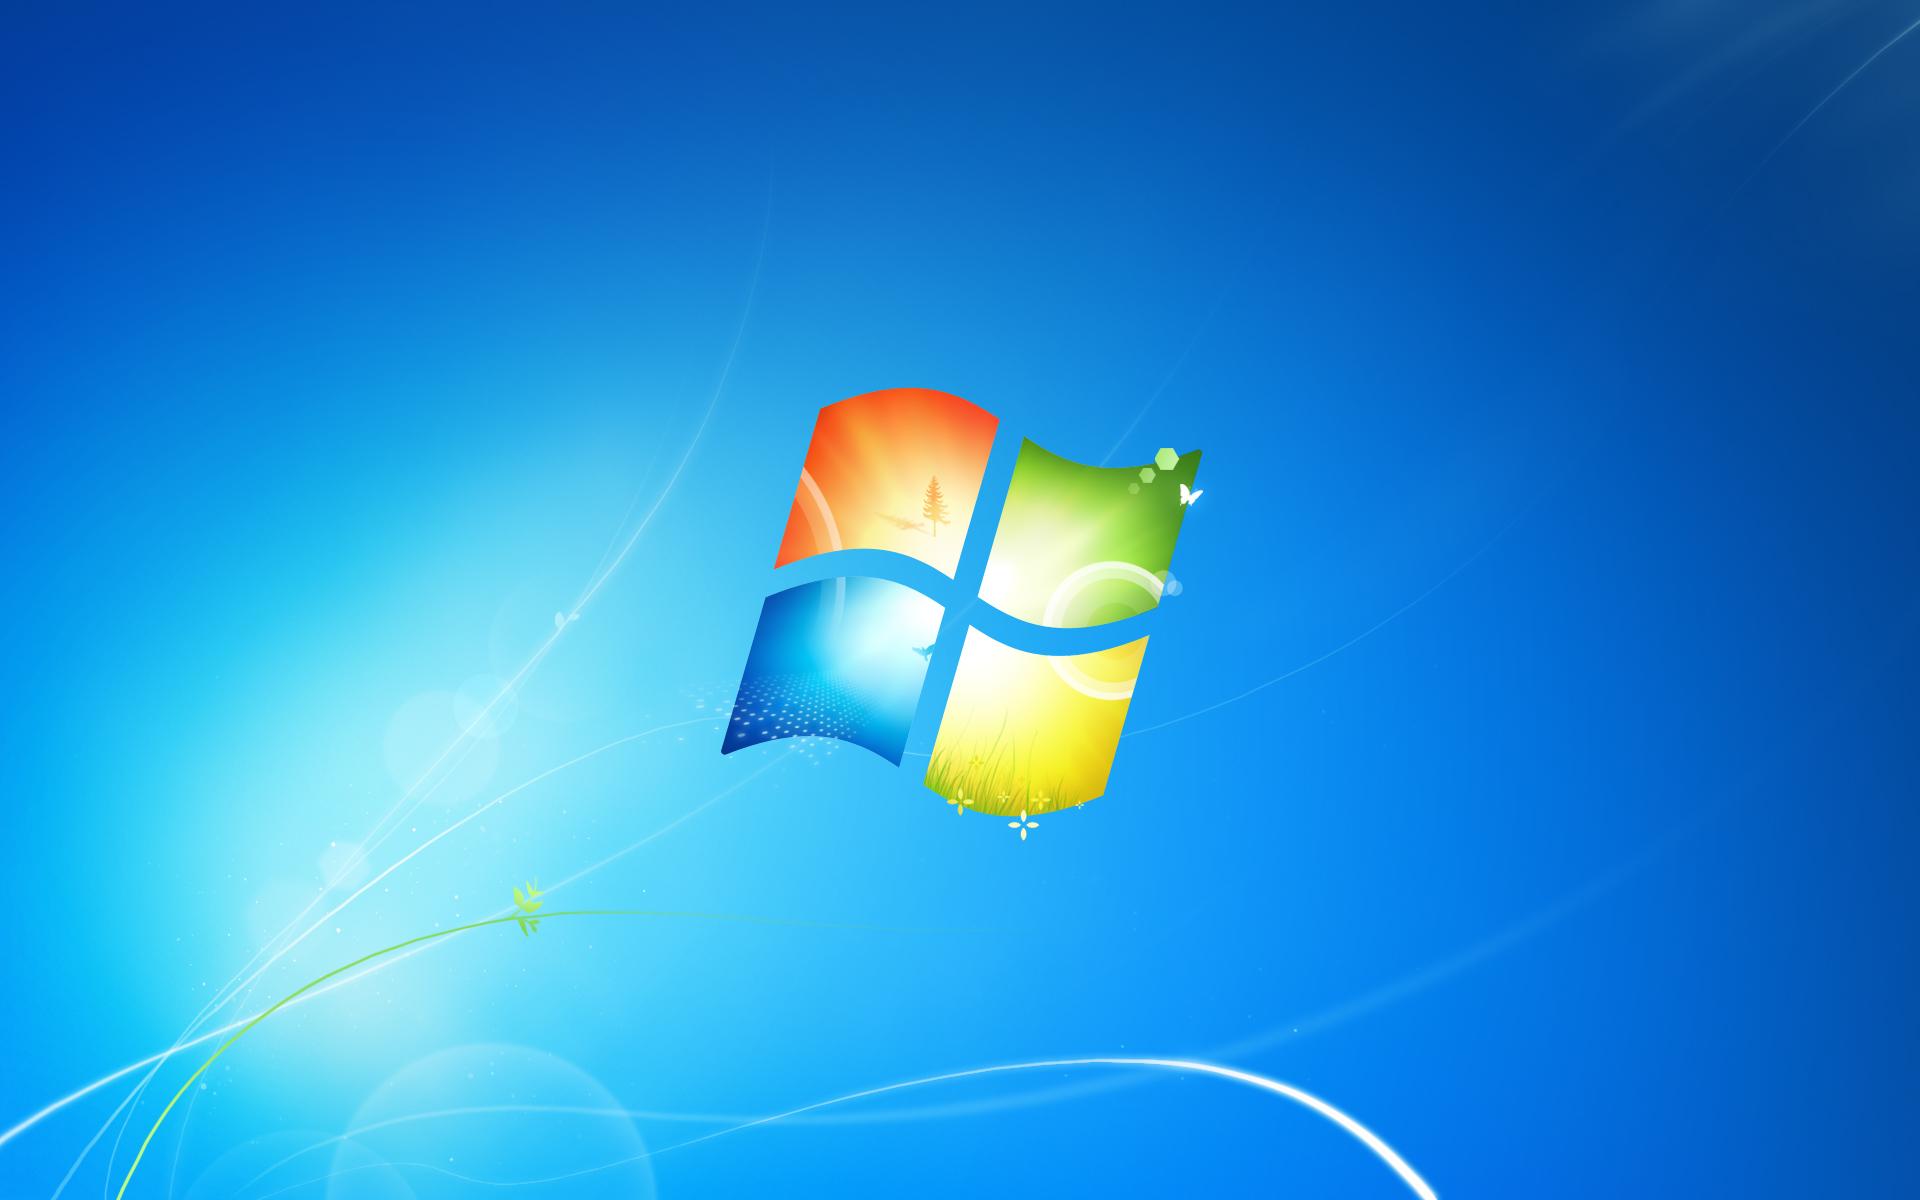 下載正版 Windows 7 ISO,Microsoft 新 Win 7 發佈站